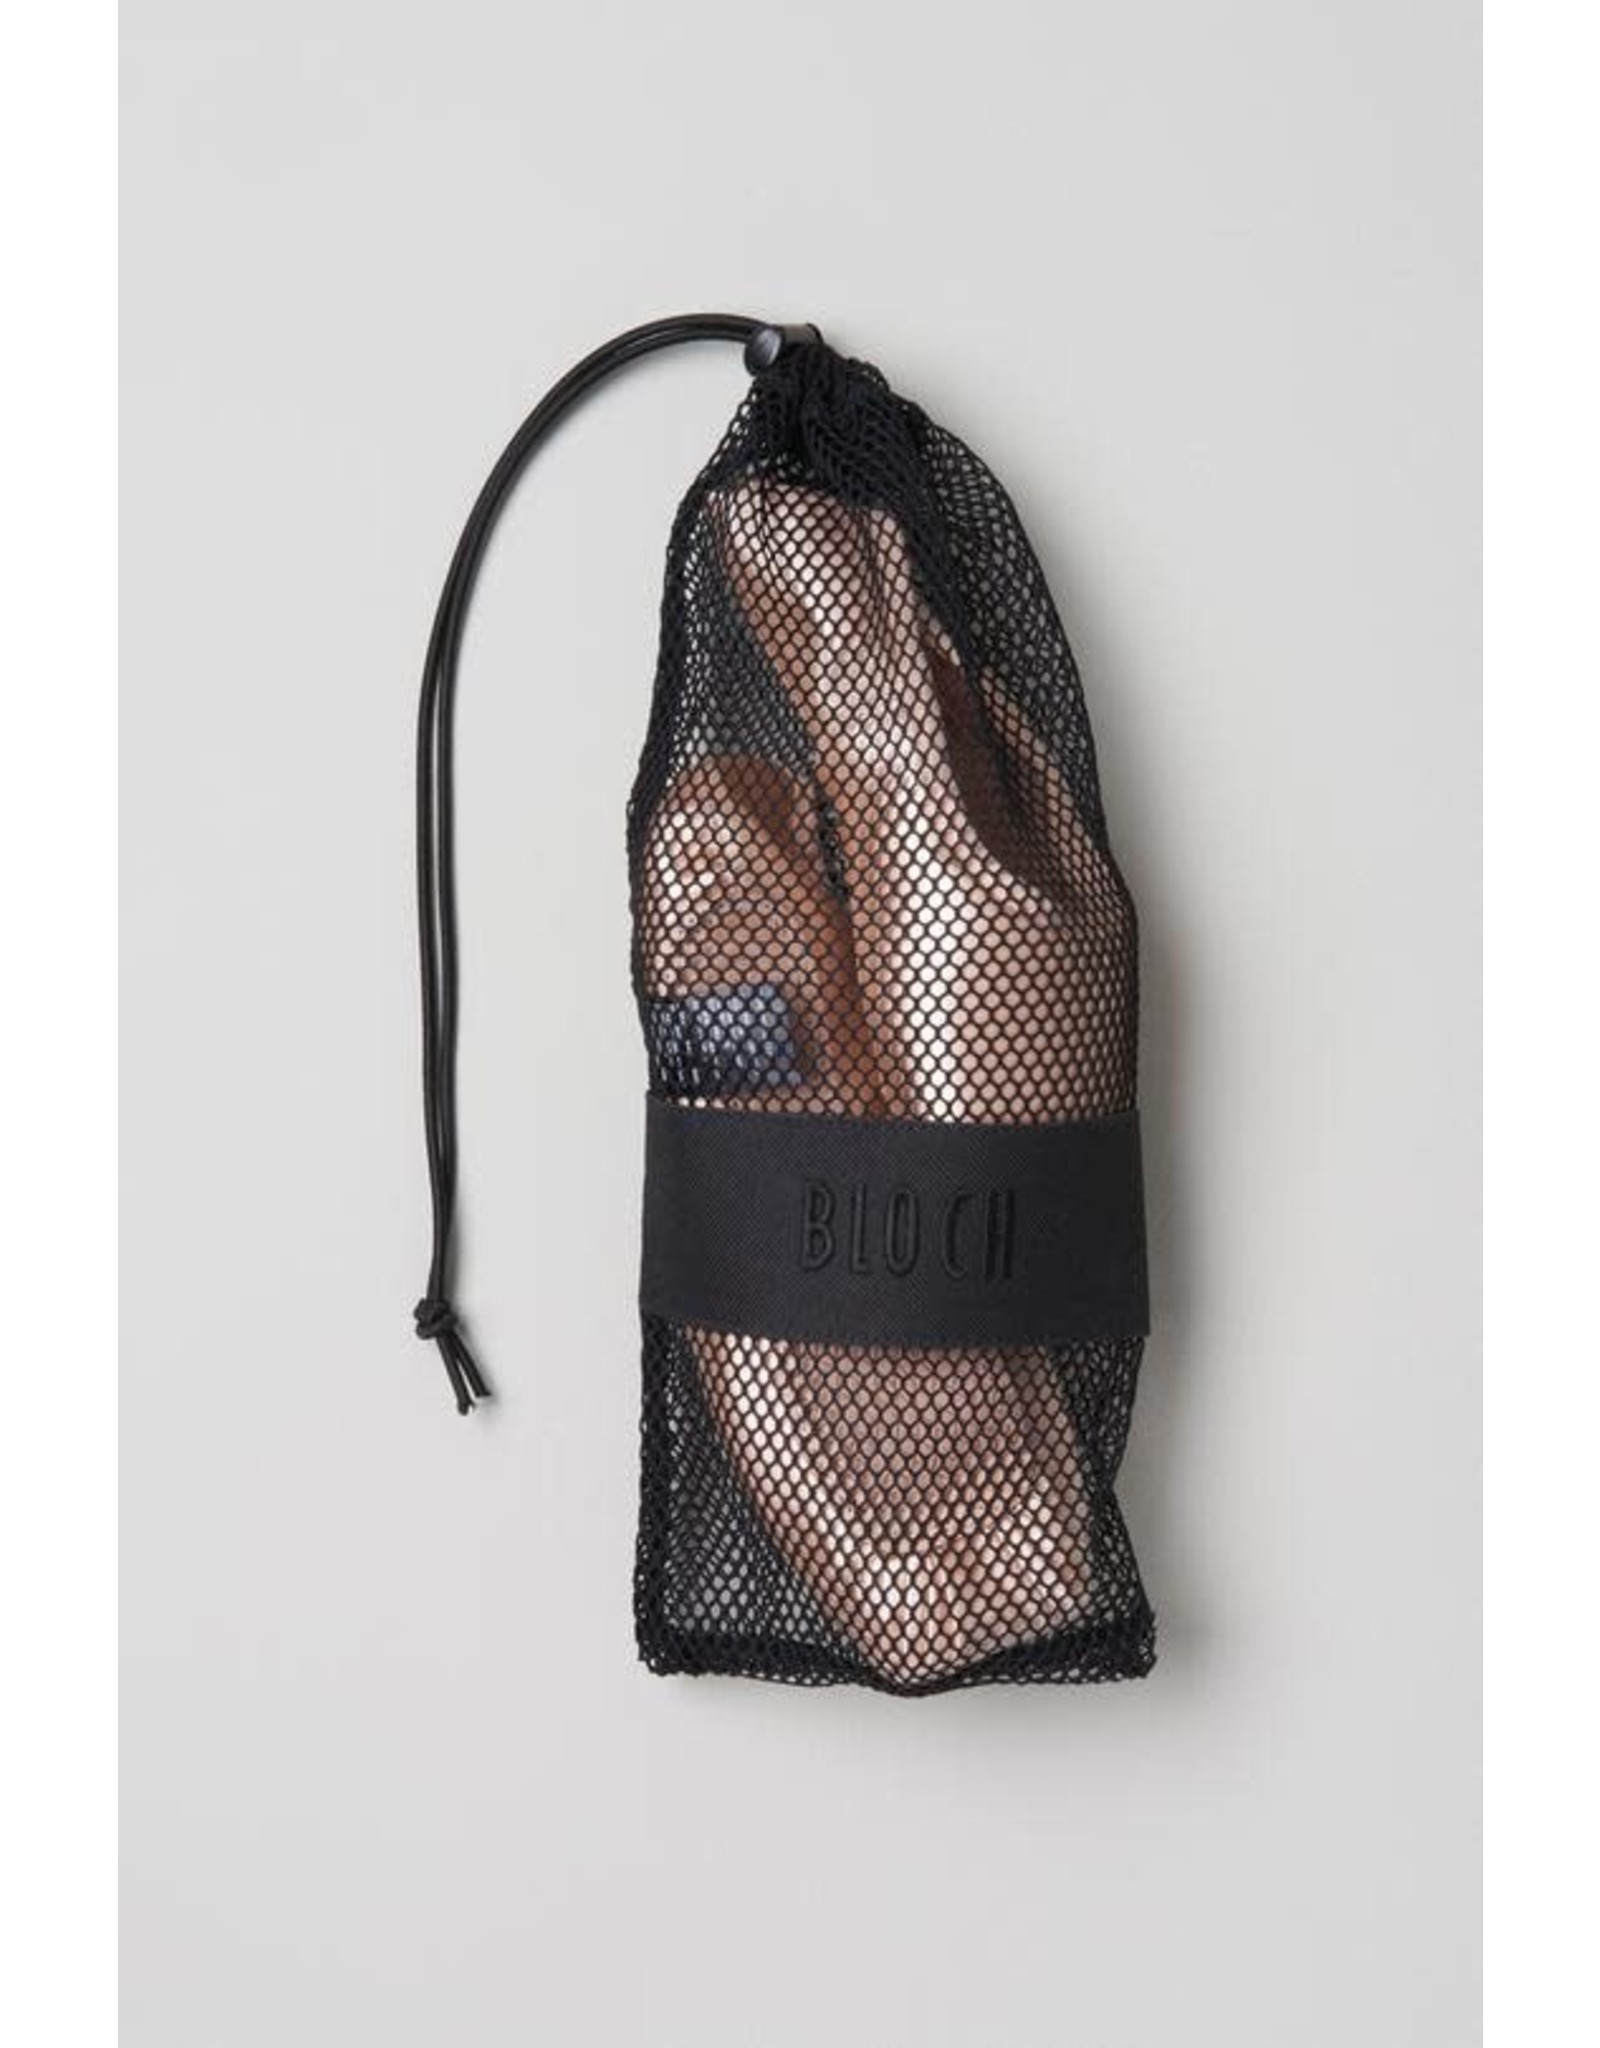 Bloch A317 Pointe shoe bag